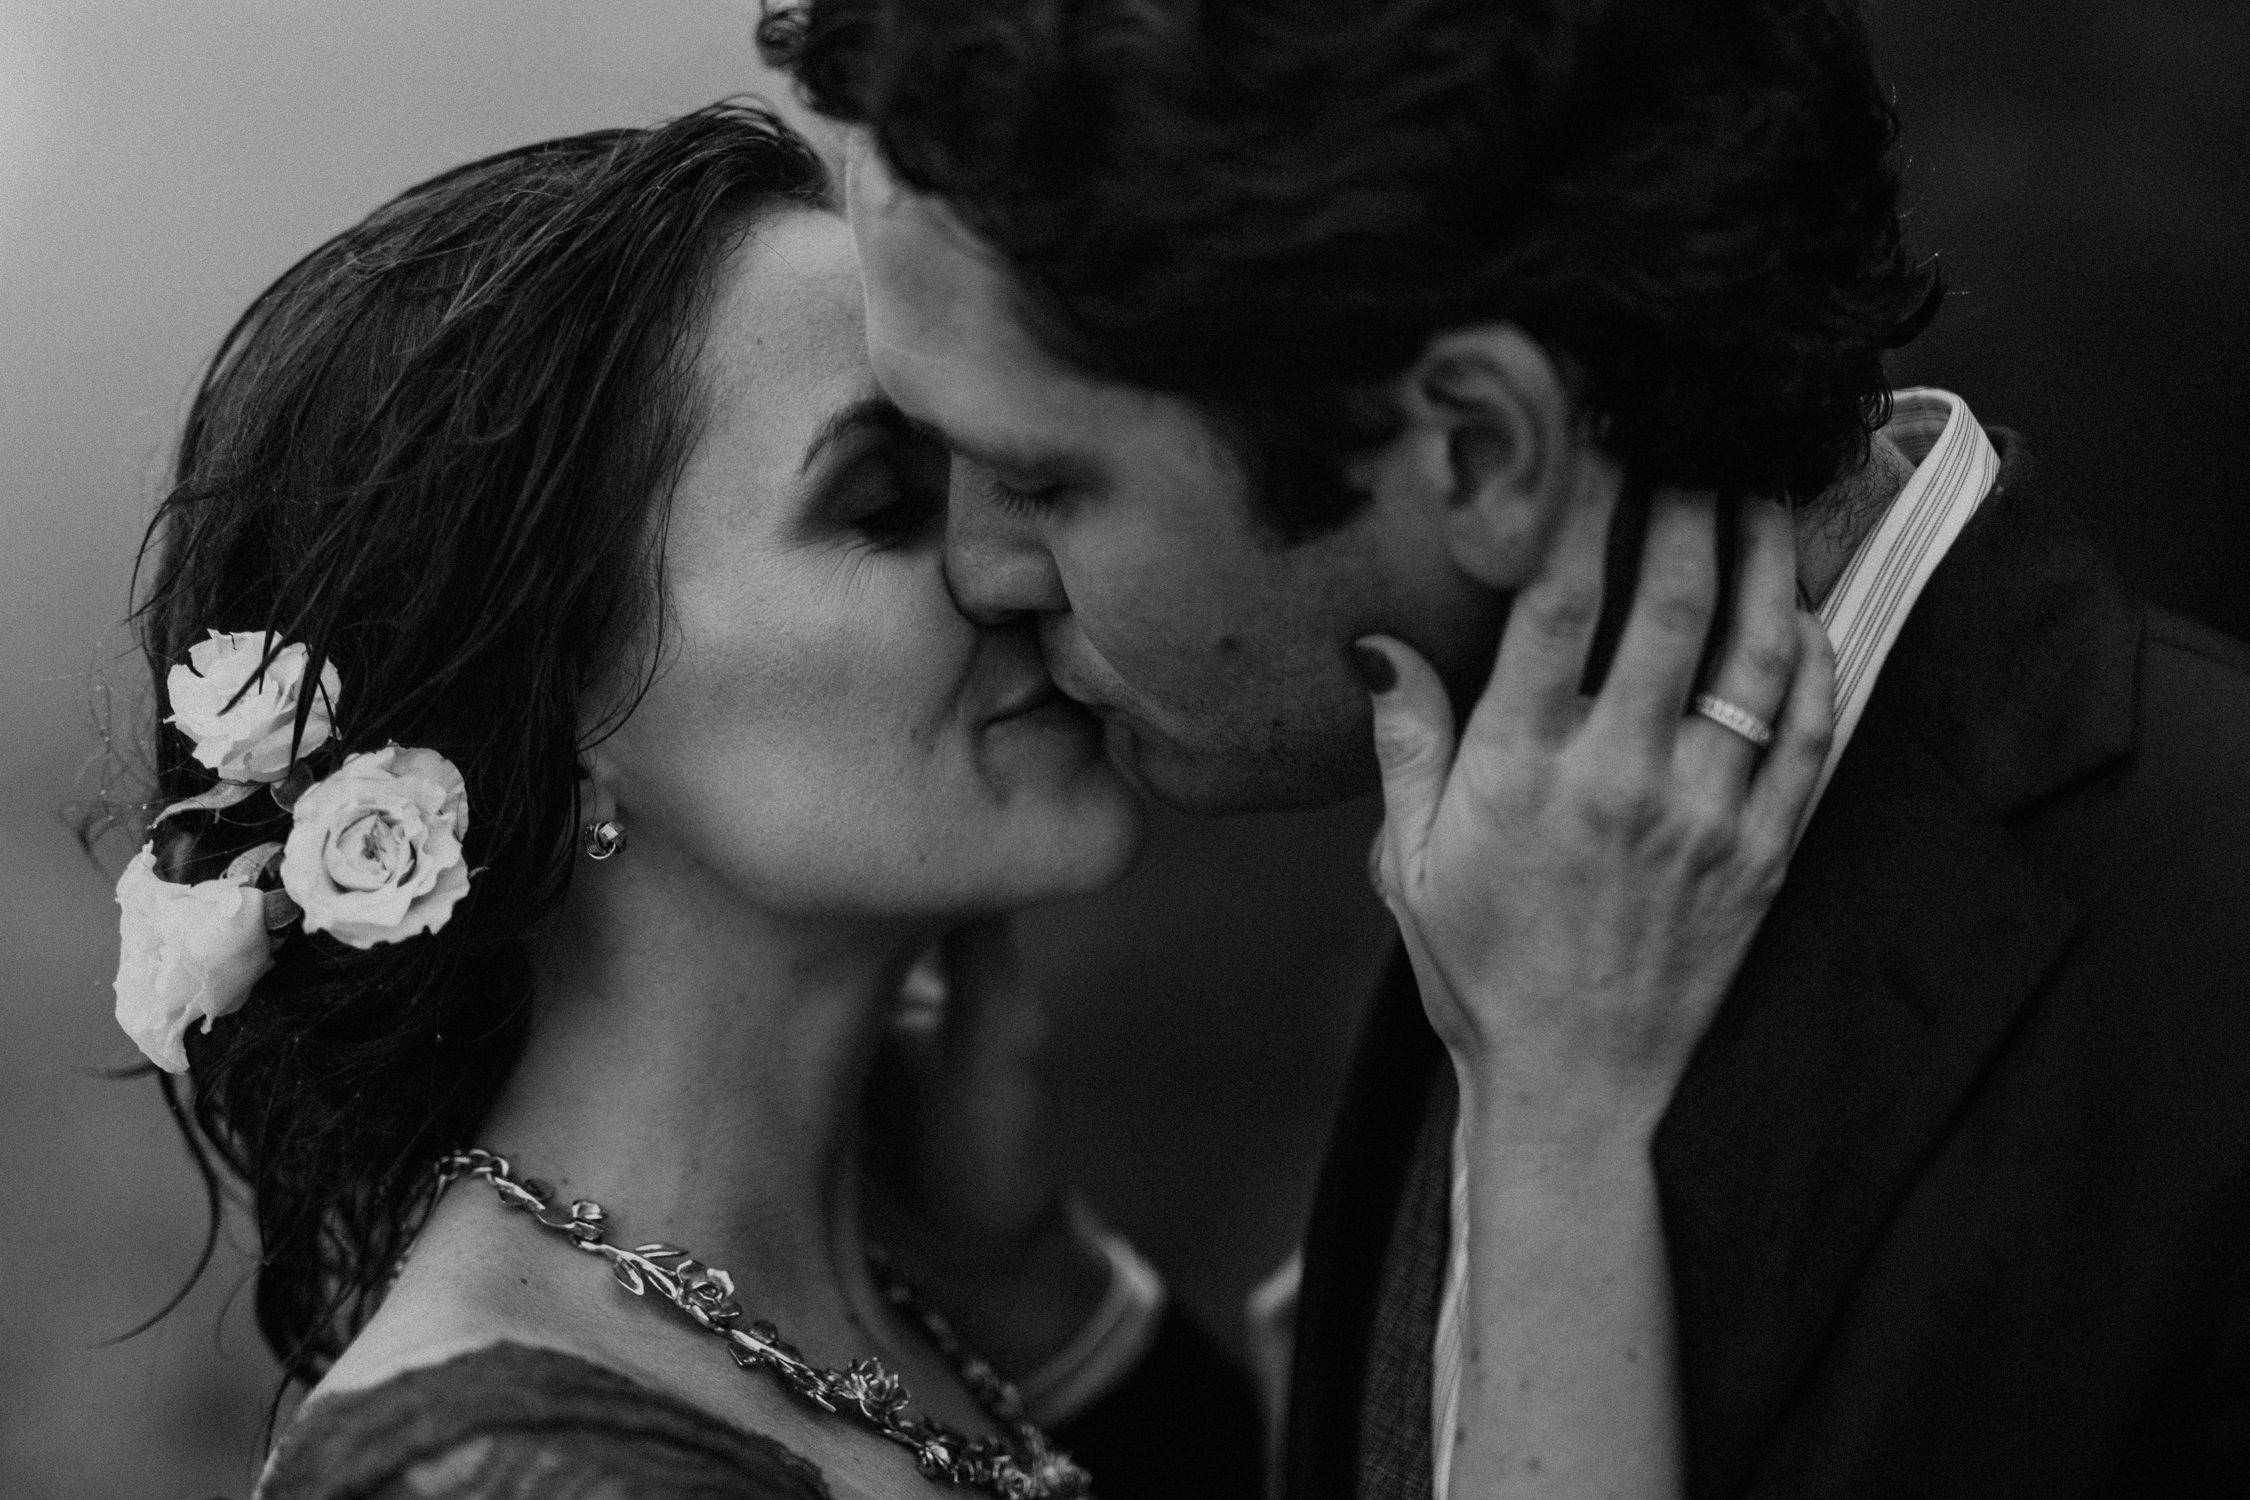 couple-intimate-engagement-session-mt-tam-23.jpg